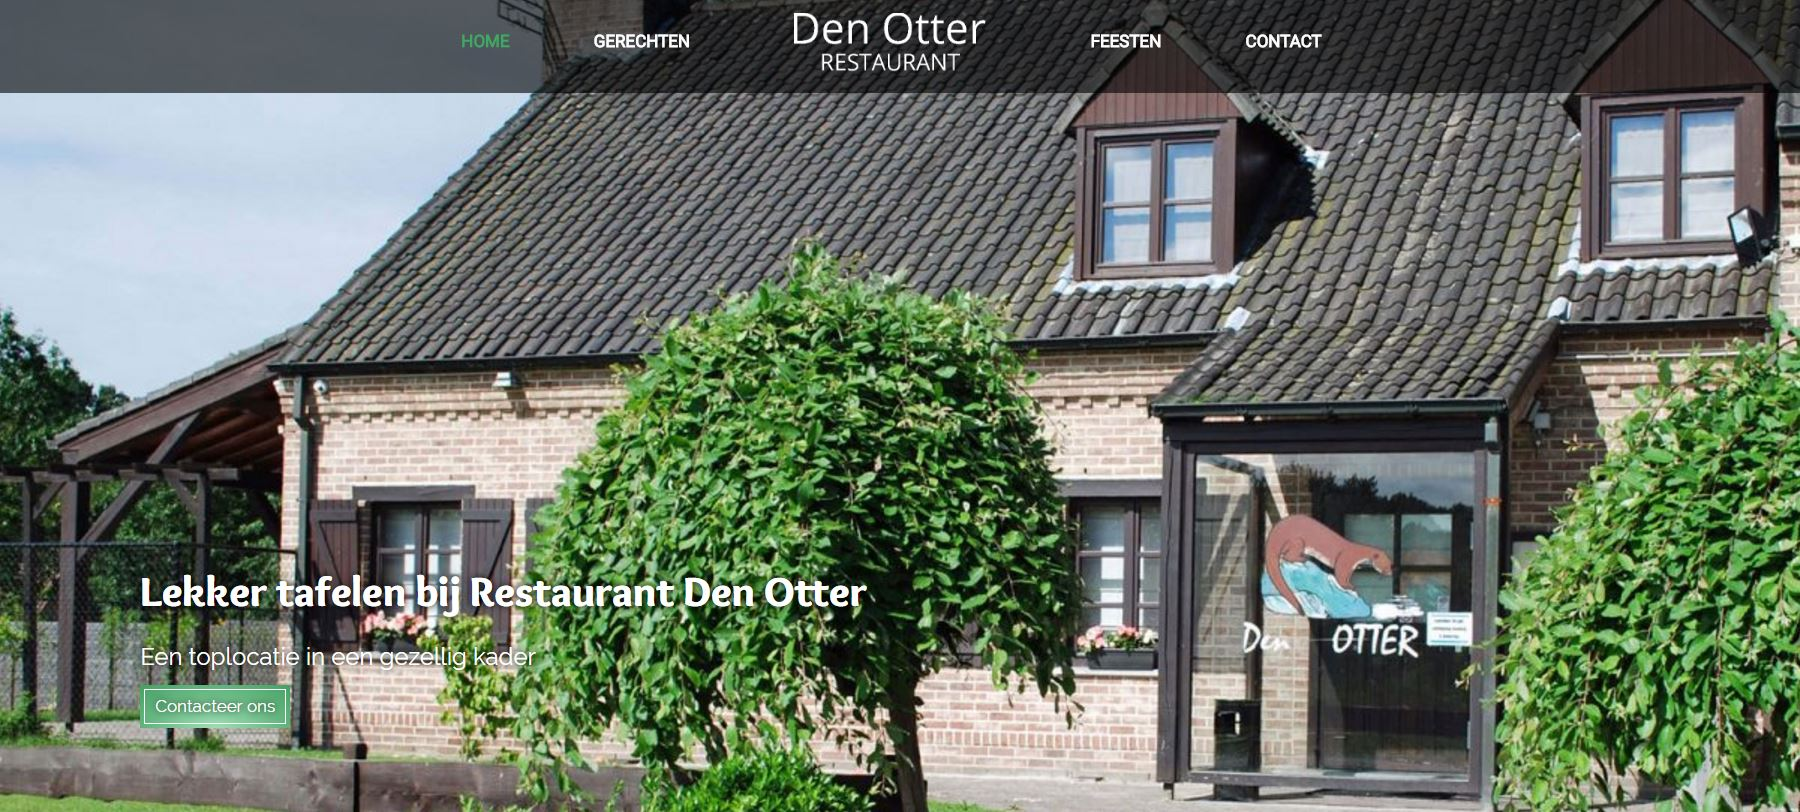 Restaurant Den Otter in Hamme online